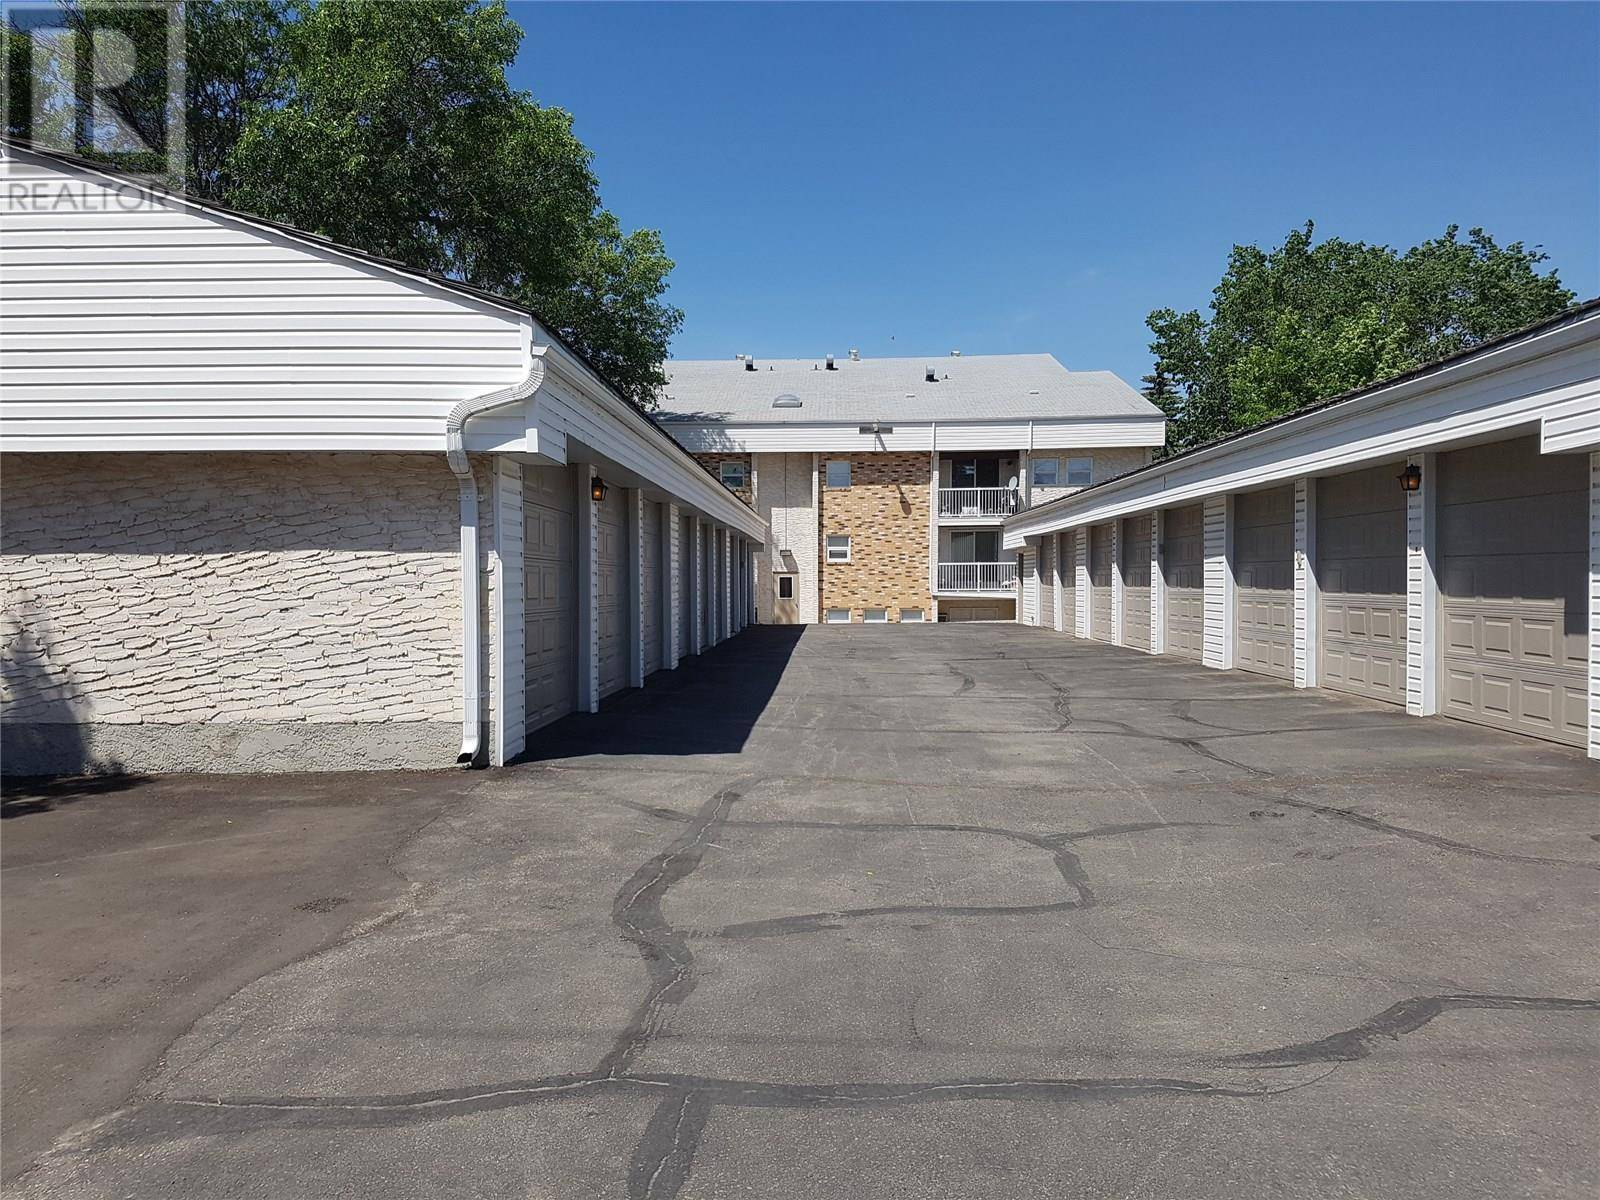 Condo for sale at 228 3rd St Ne Unit 42 Weyburn Saskatchewan - MLS: SK776038